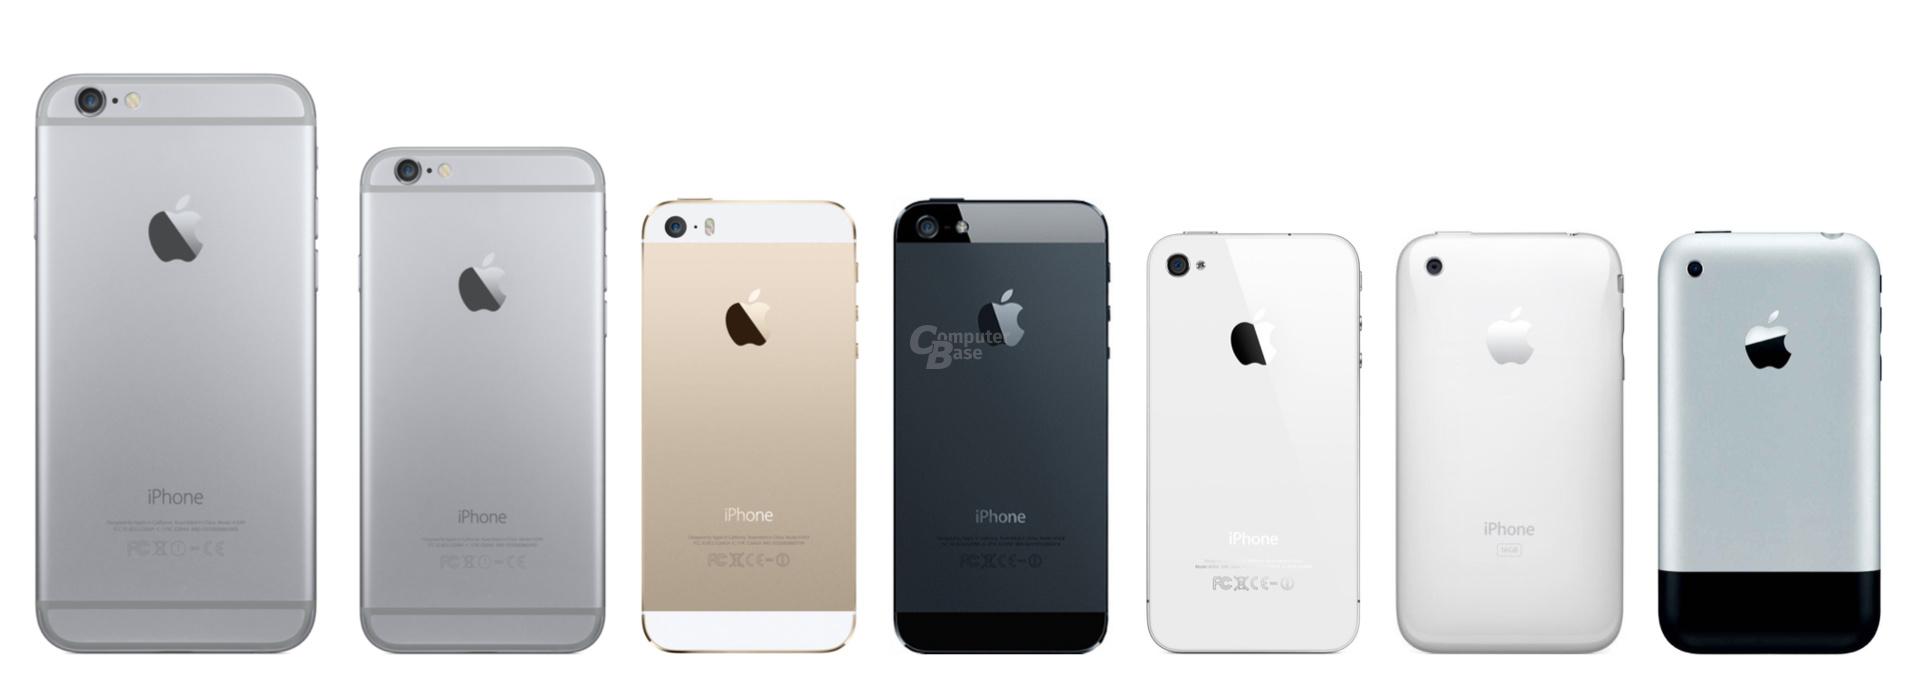 v.l.n.r.: iPhone 6 (Plus), 5S, 5, 4S/4, 3GS/3G und iPhone (Rückseite)